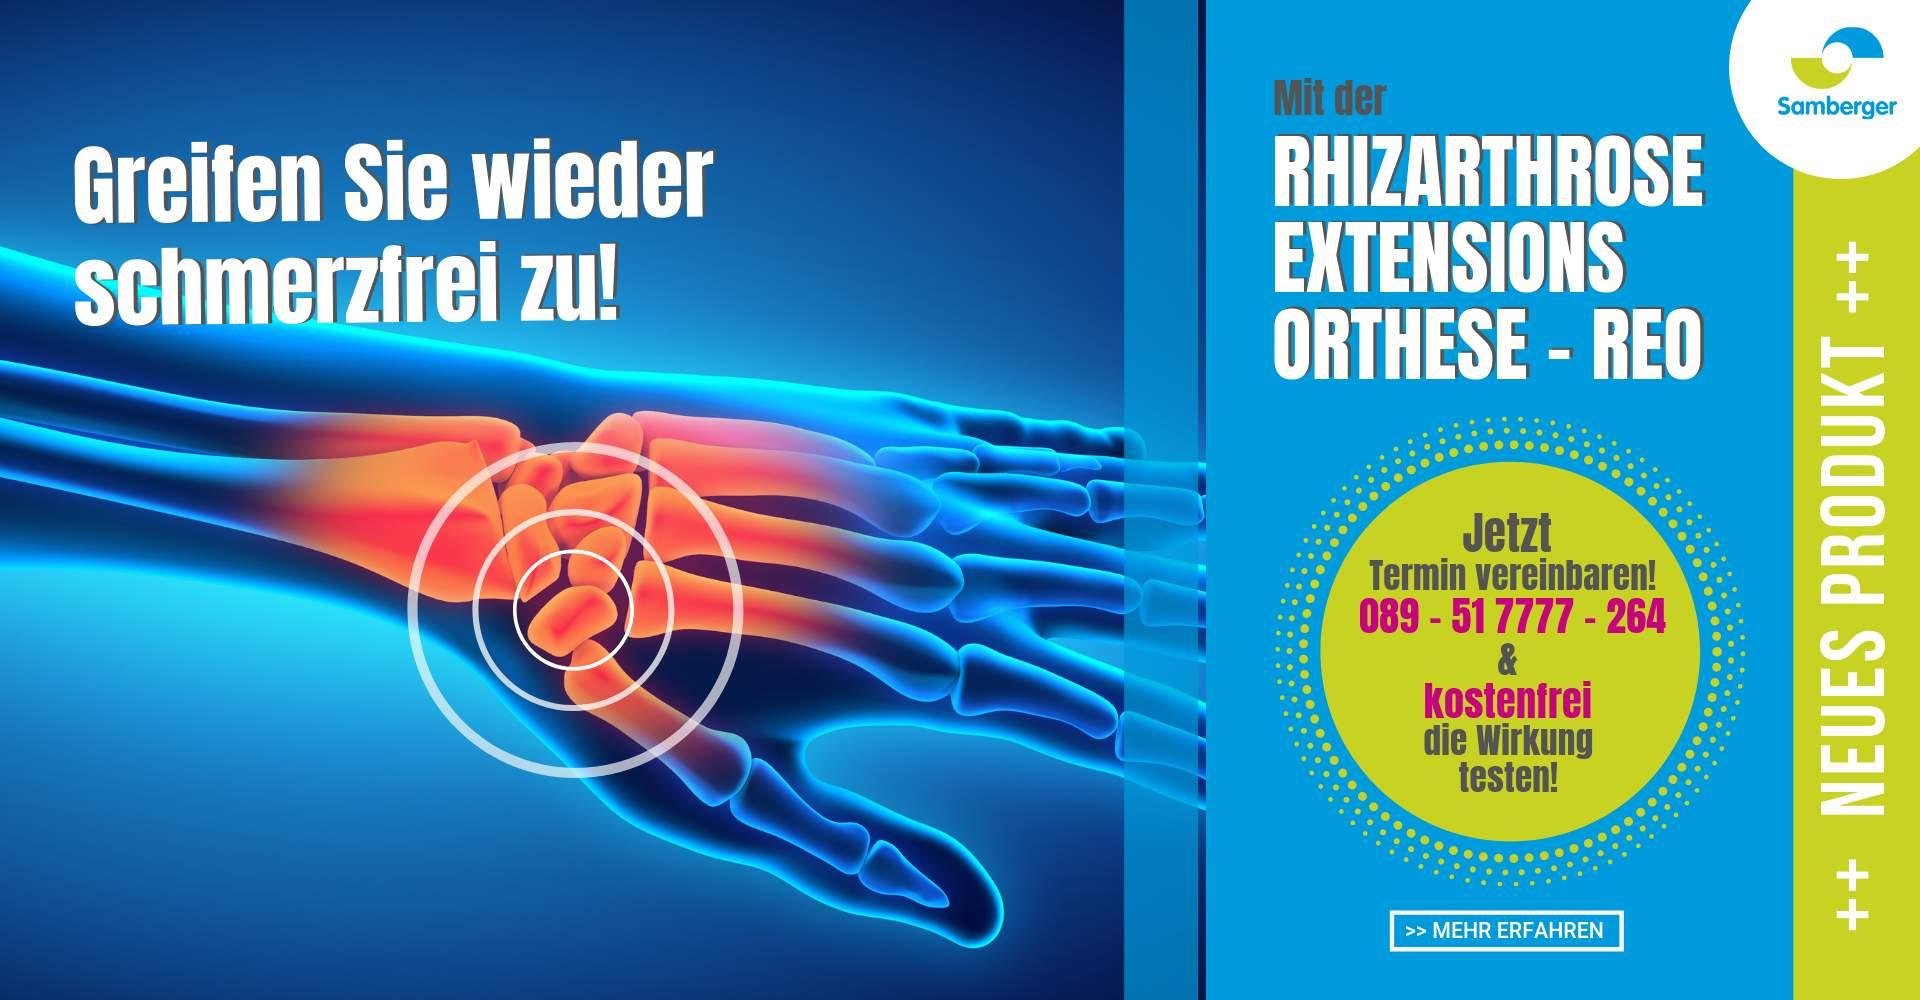 slider rhizarthroseextensionsorthese 1920x1000 q90 crop replace alpha fff subsampling 2